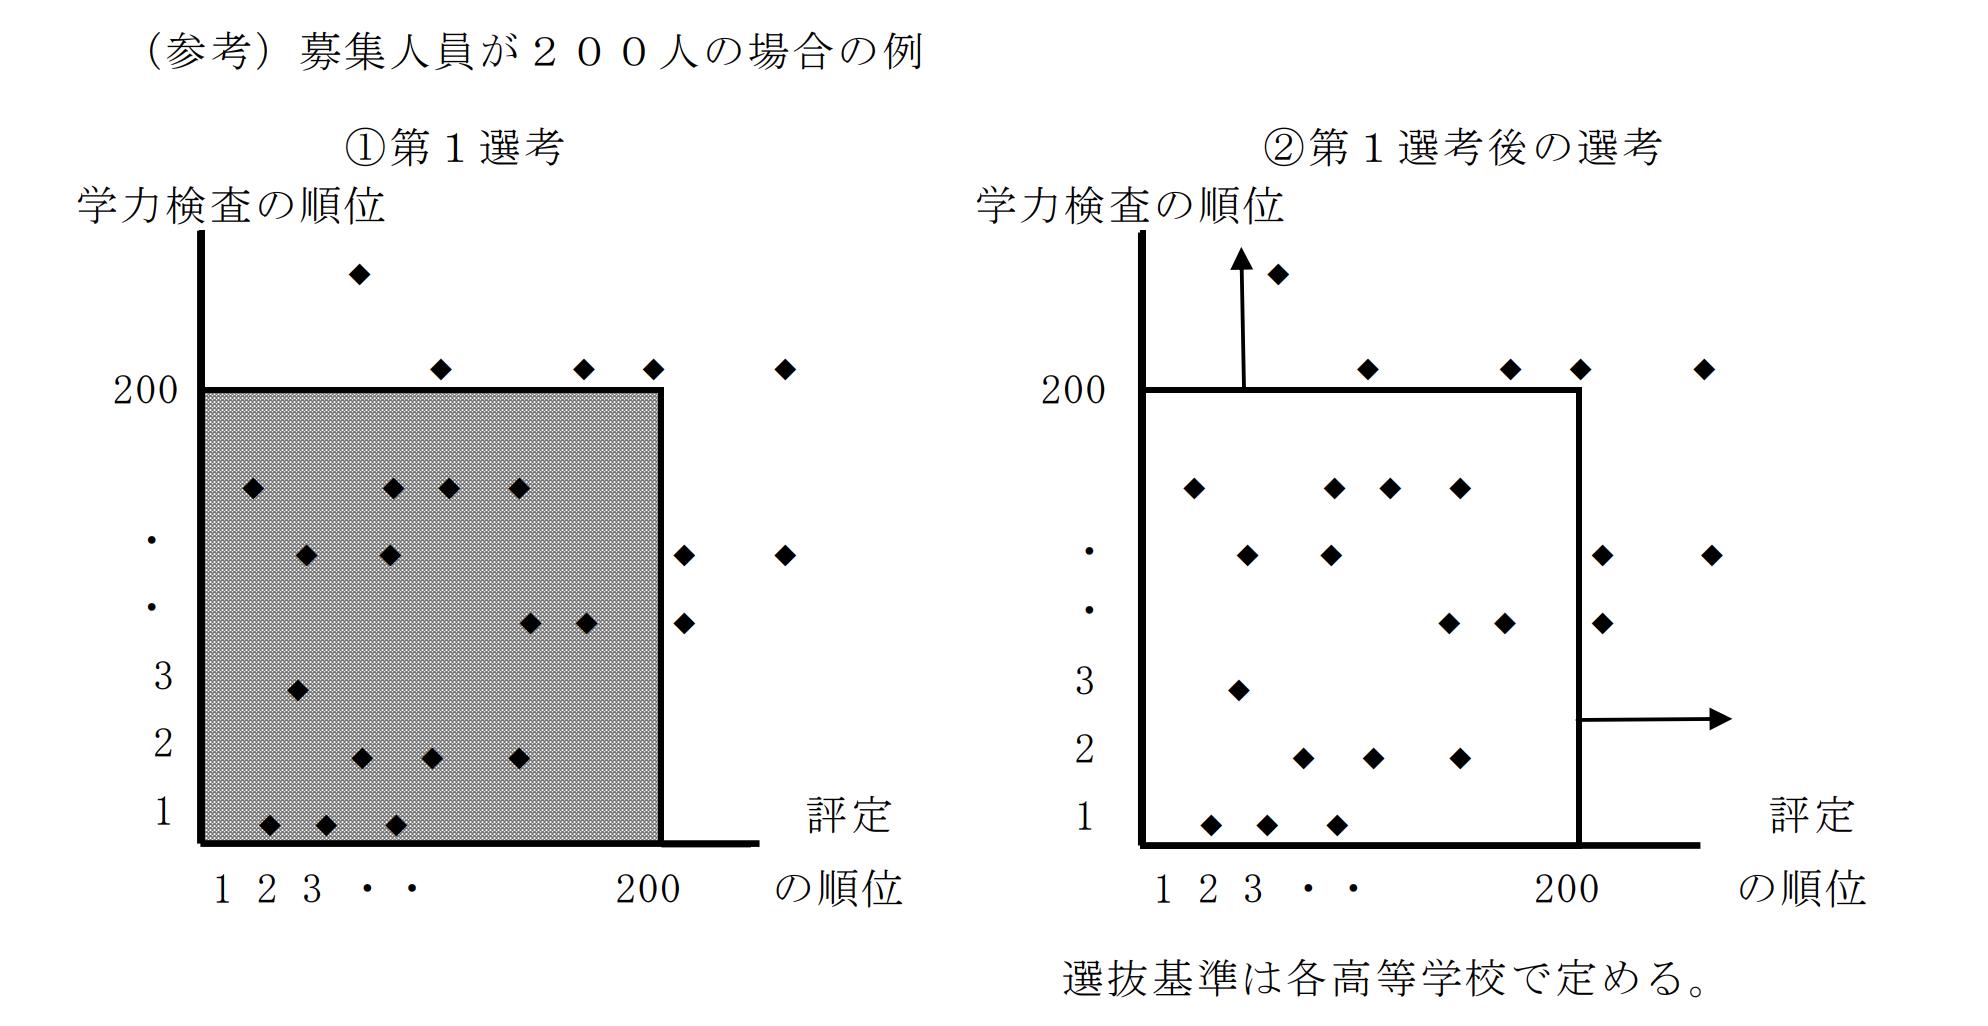 熊本県の公立高校入試制度1